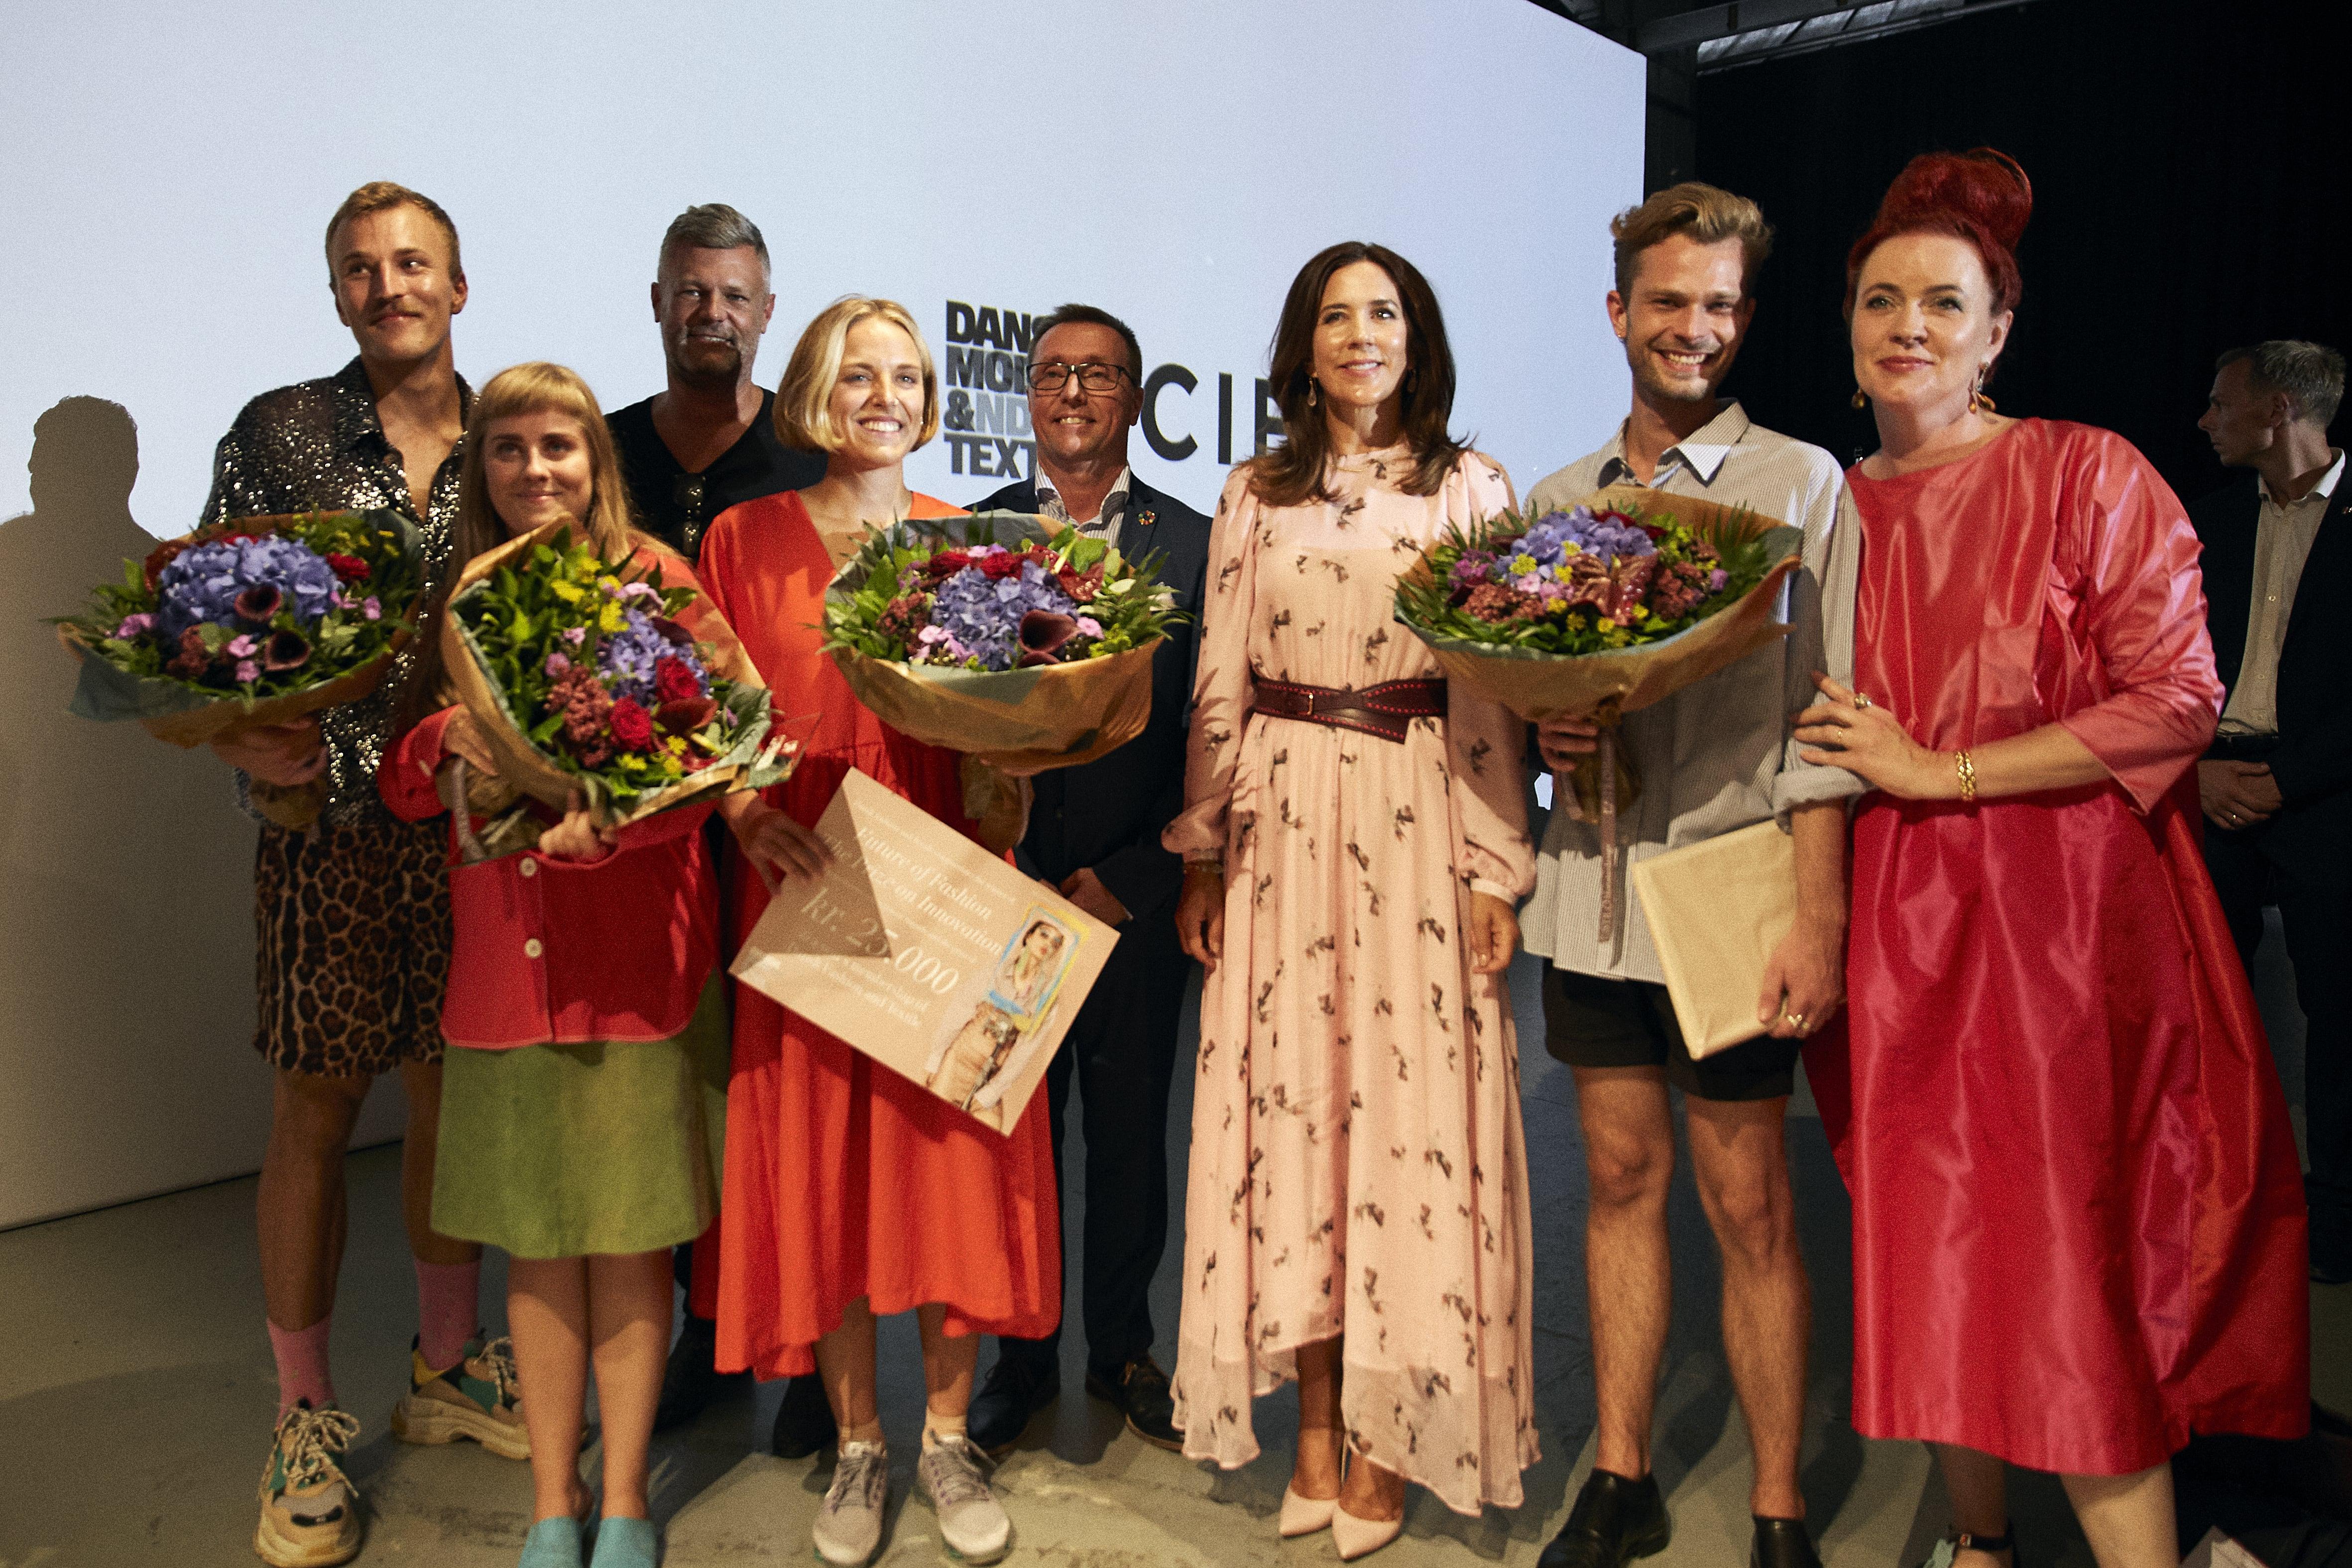 Future Of Fashion 2018: Et Royalt Rendezvous Af Designtalent